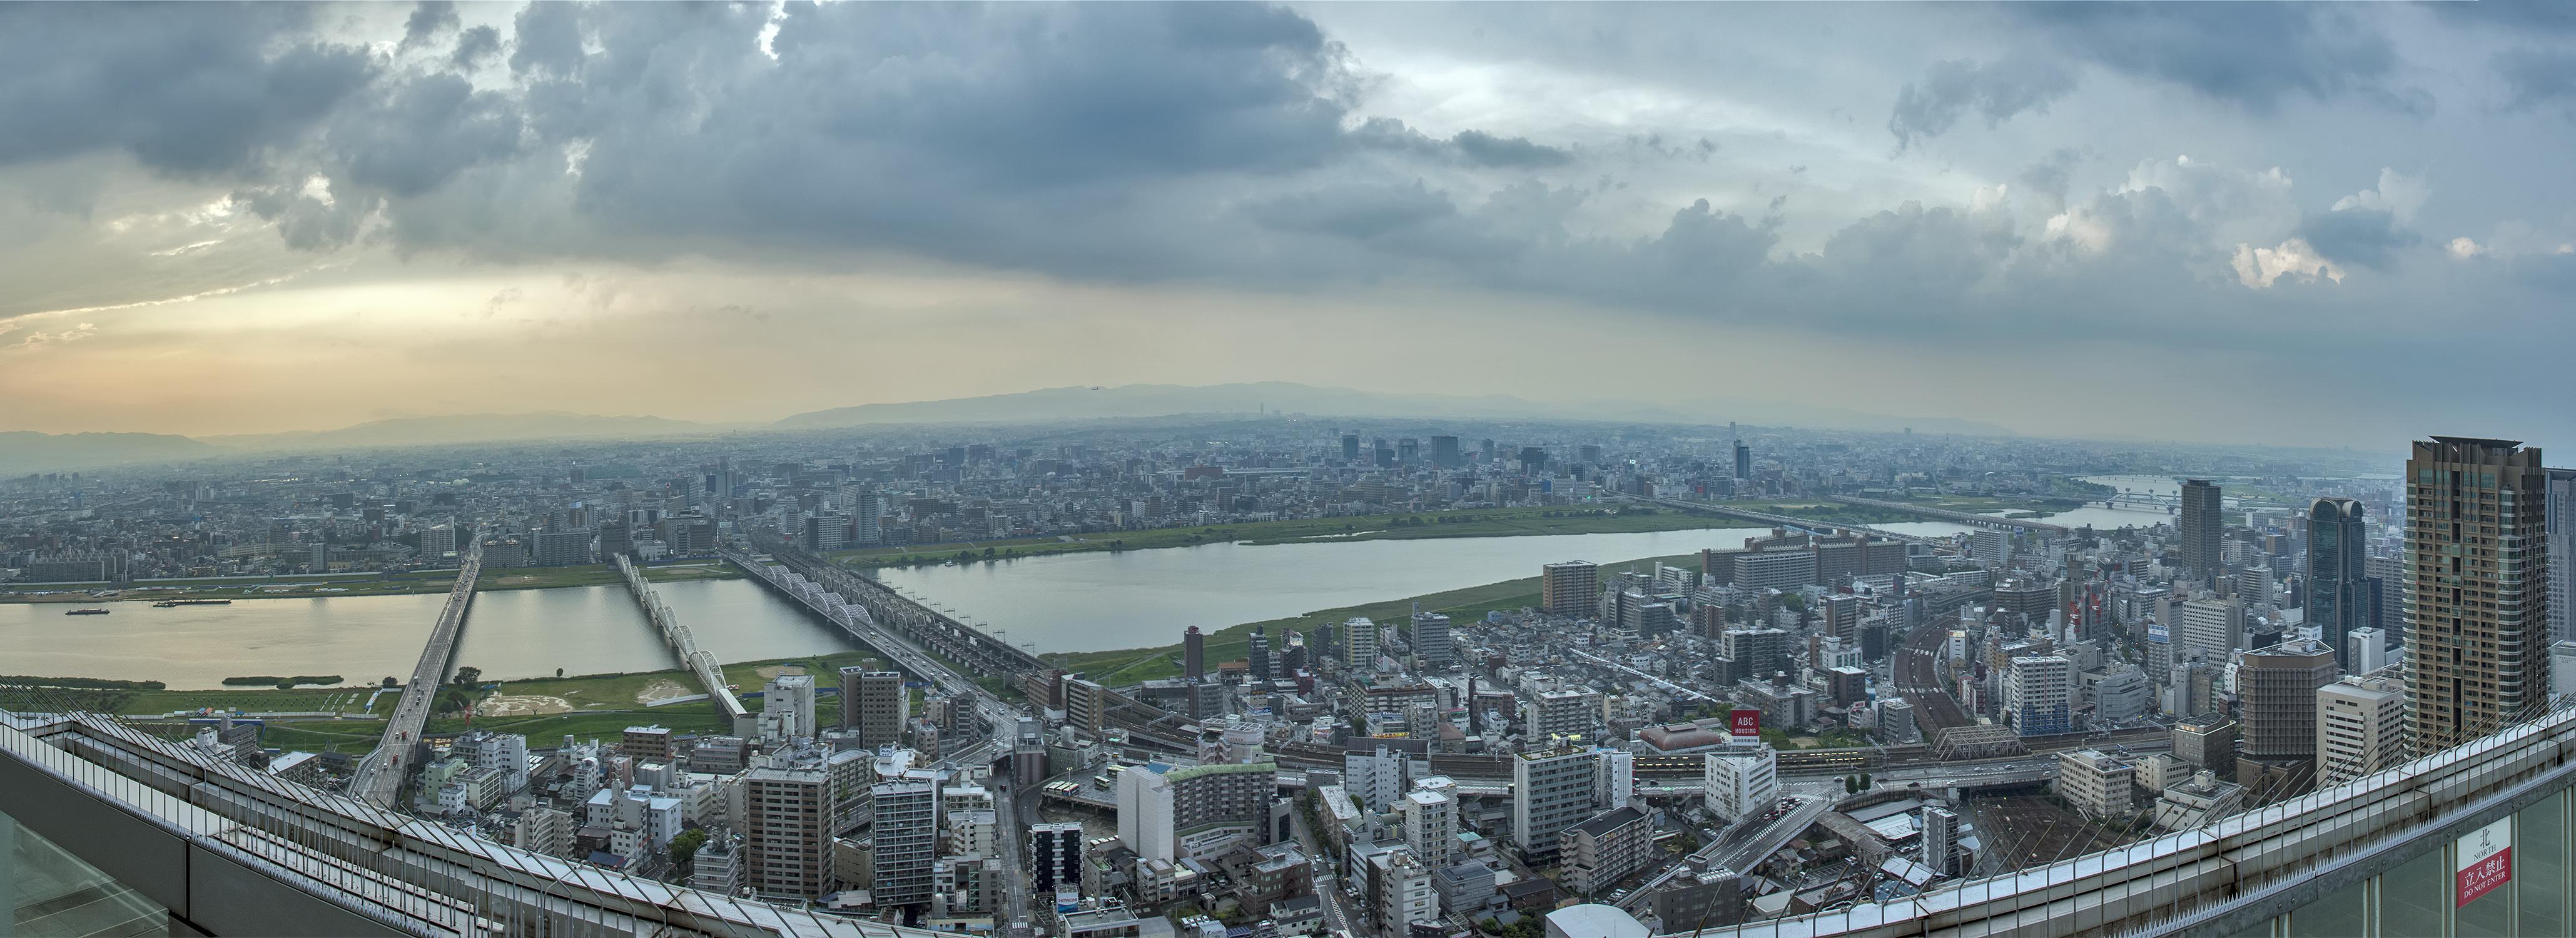 Umeda Sky Building 梅田スカイビル « TravelJapanBlog.com